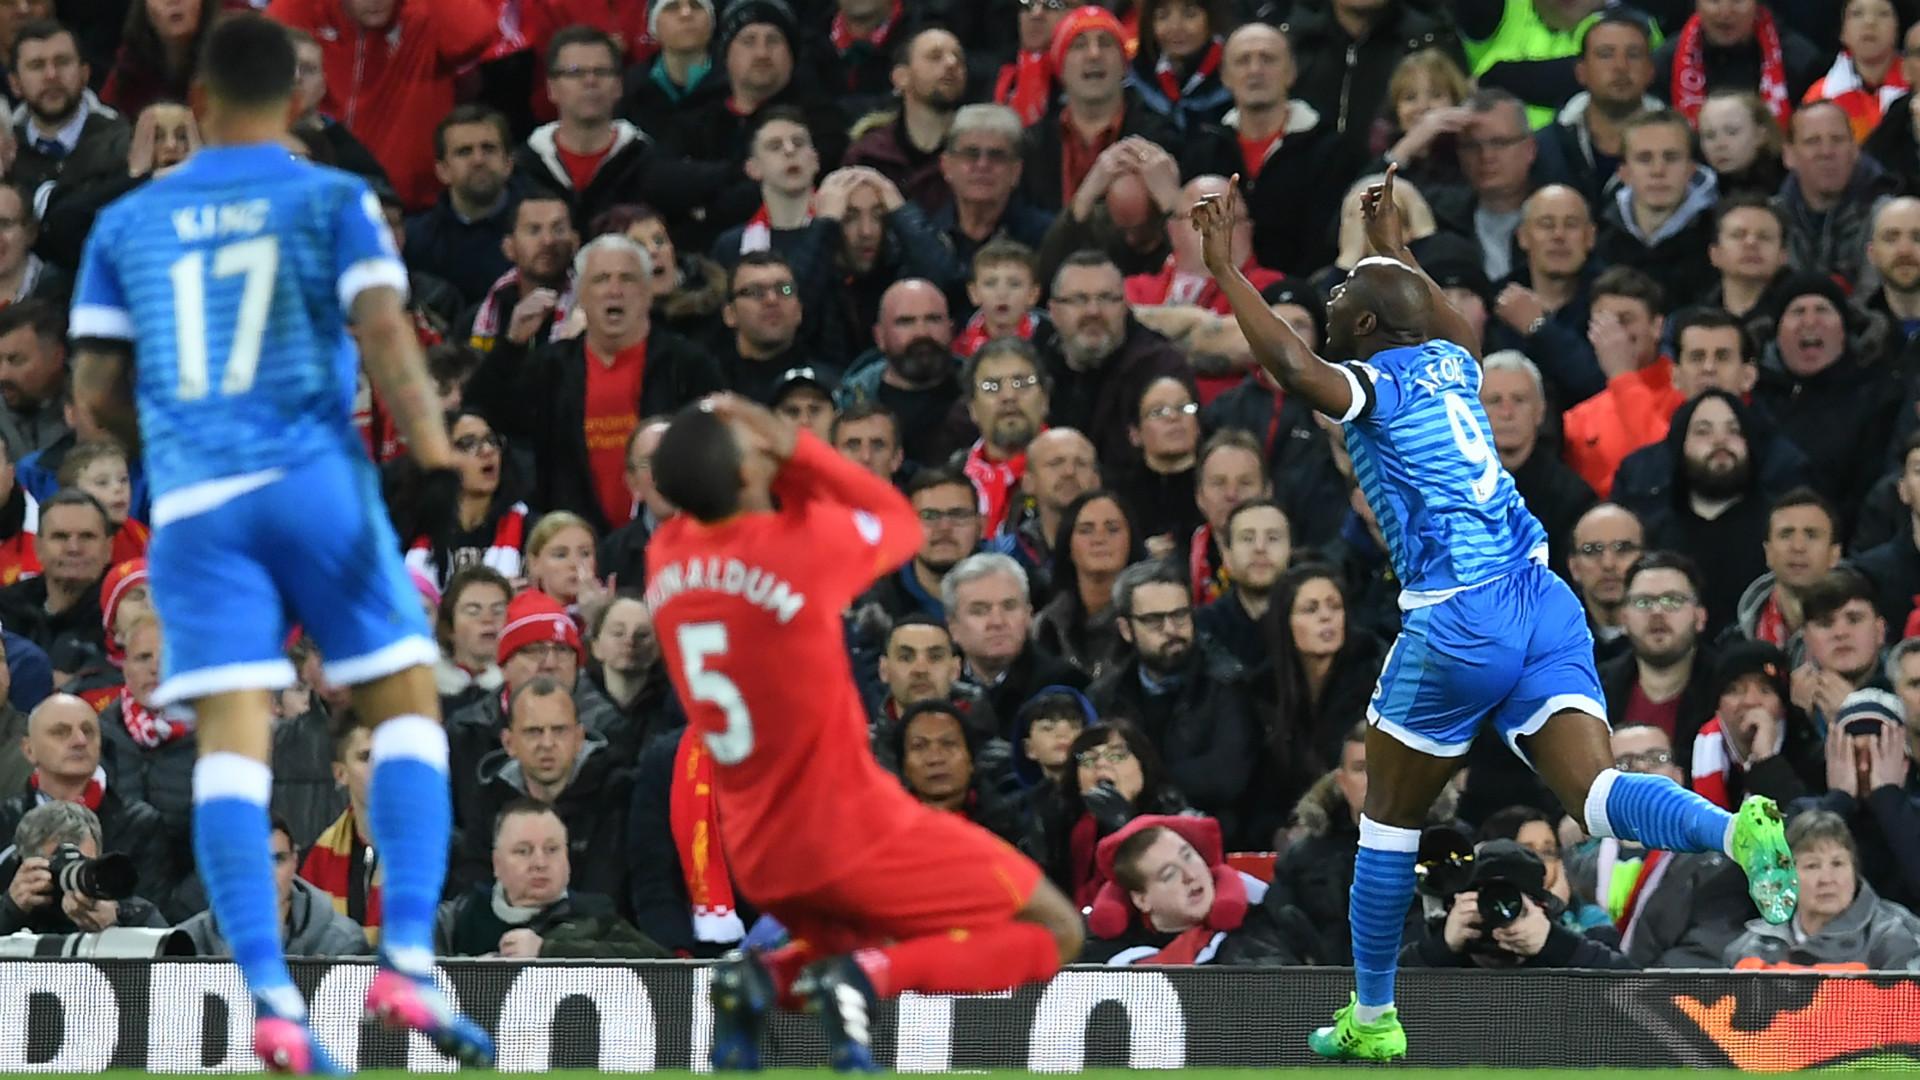 HD Bournemouth celebrate v Liverpool